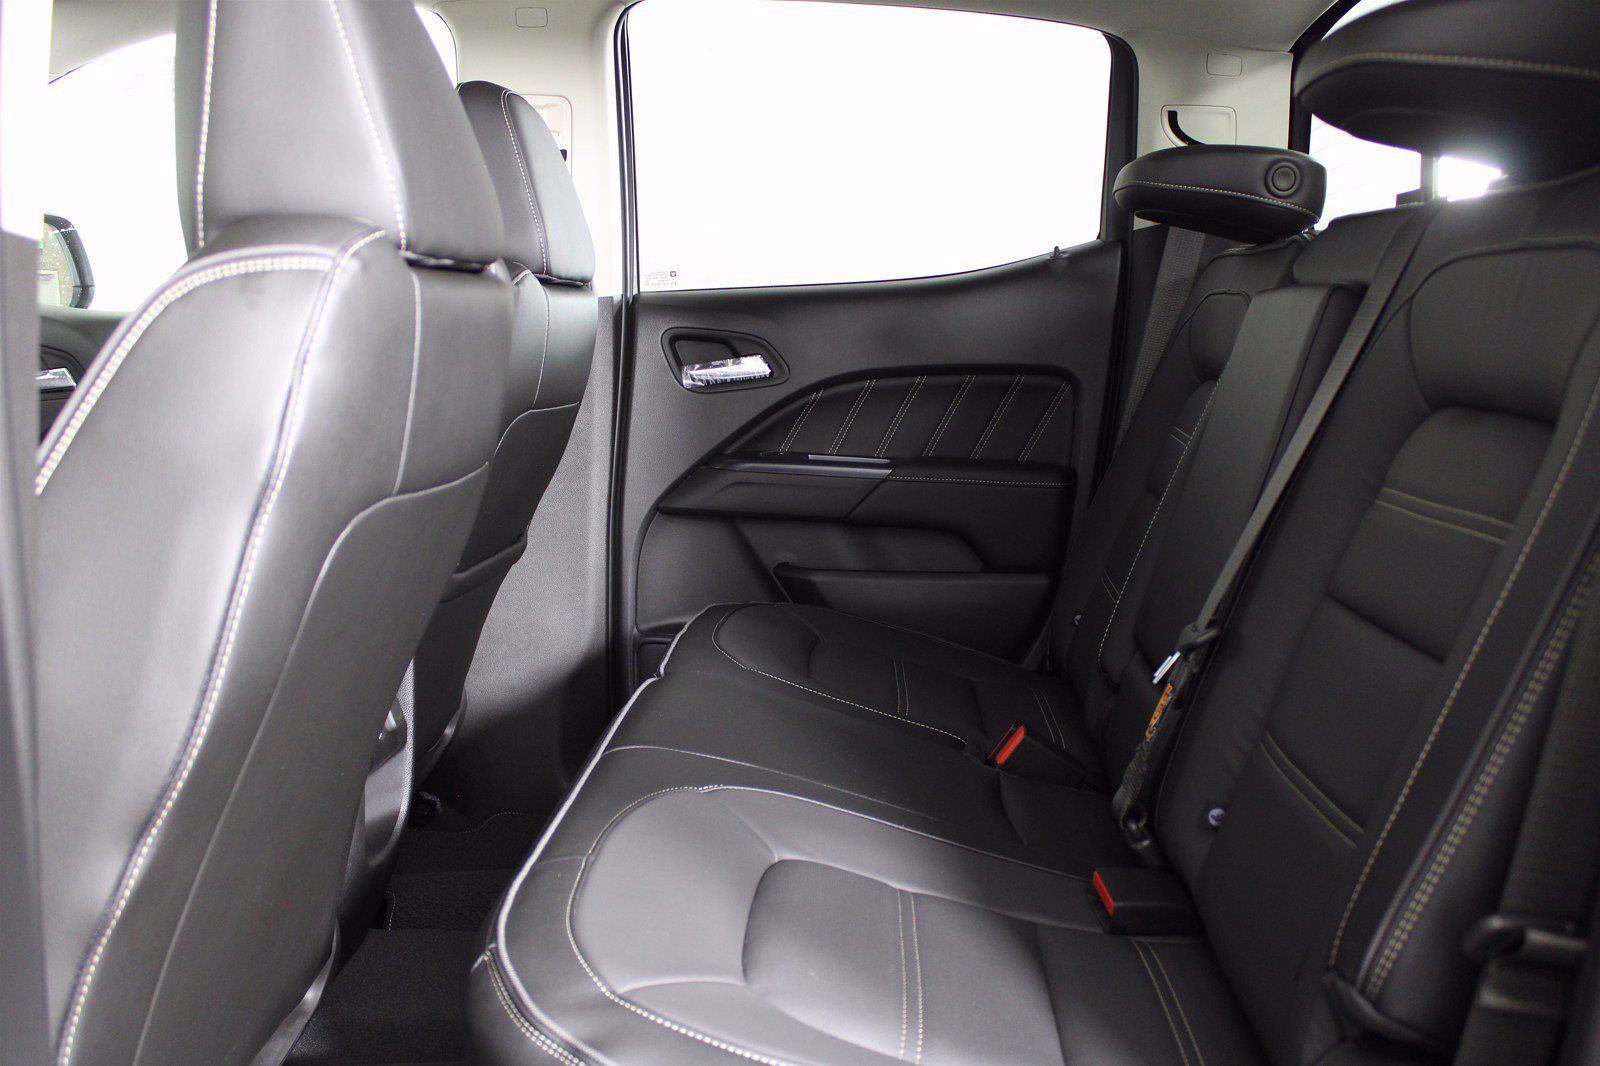 2021 GMC Canyon Crew Cab 4x4, Pickup #D410719 - photo 13